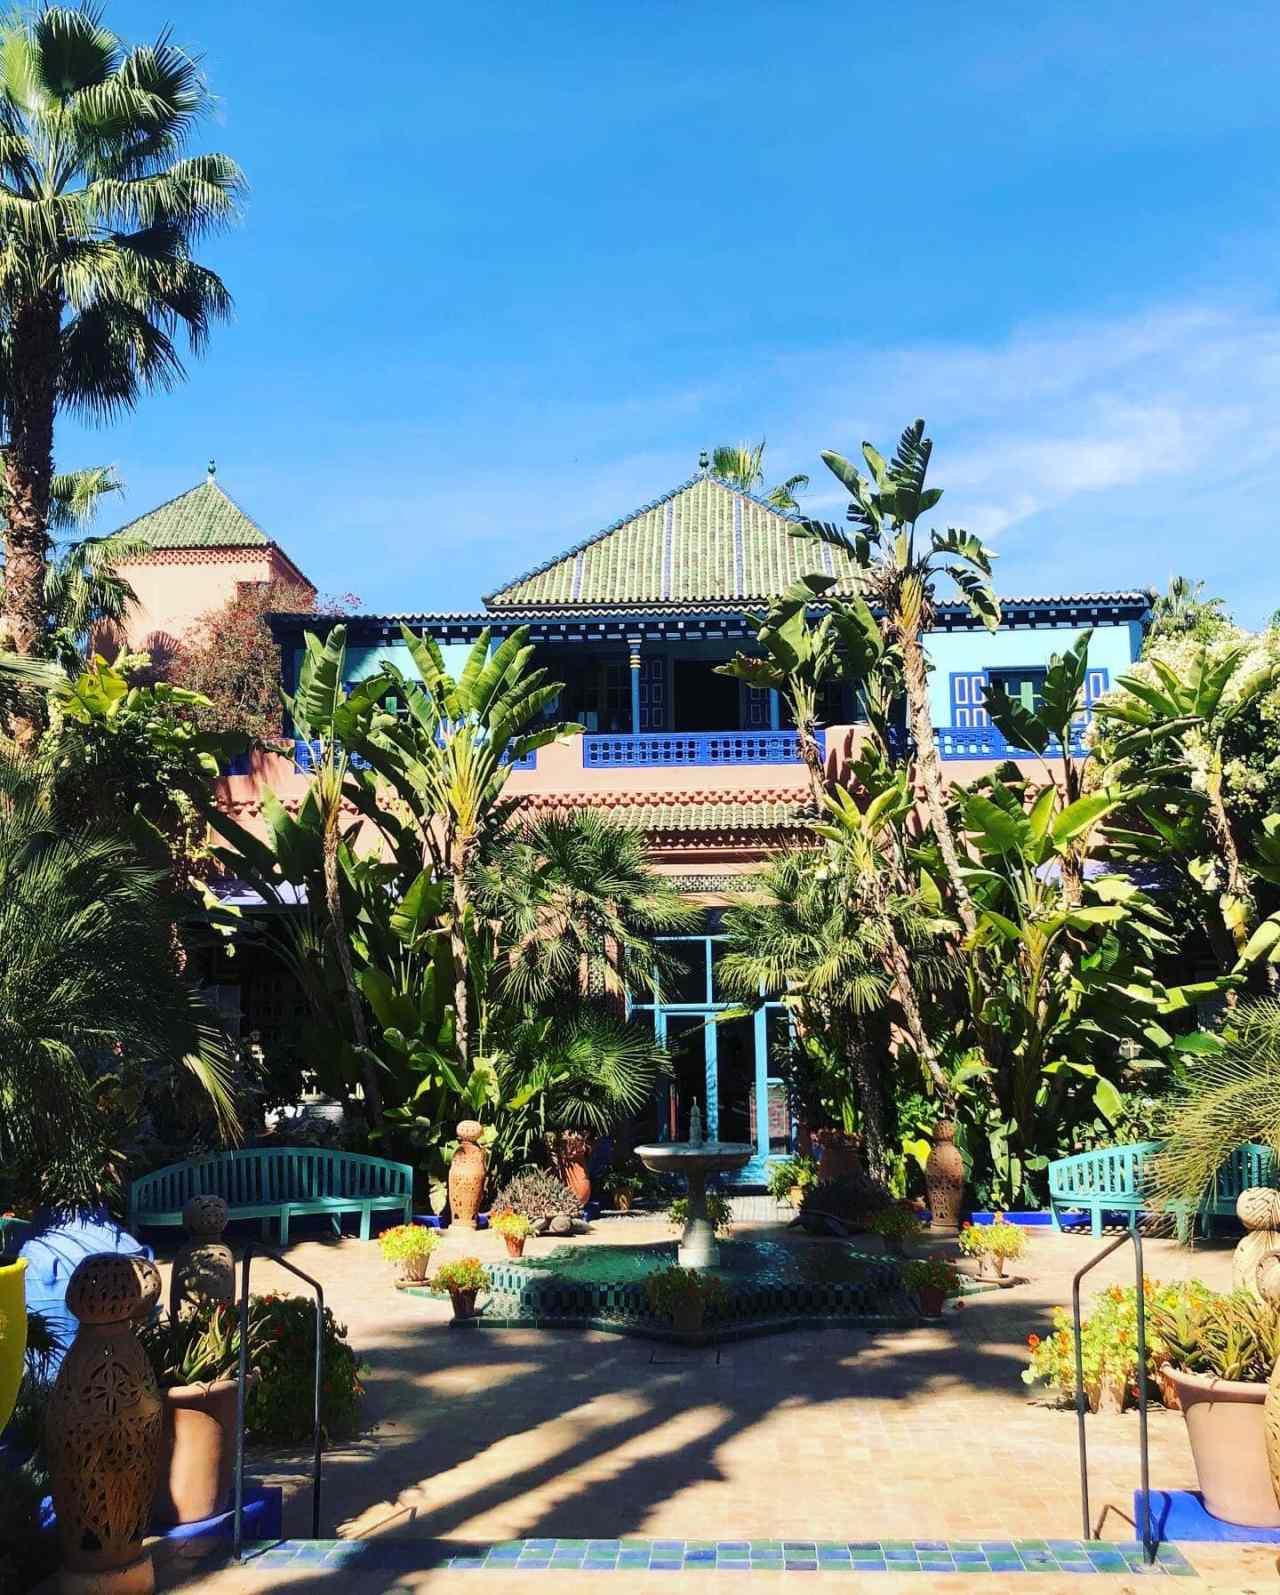 Yves Saint Laurent house Marrakech